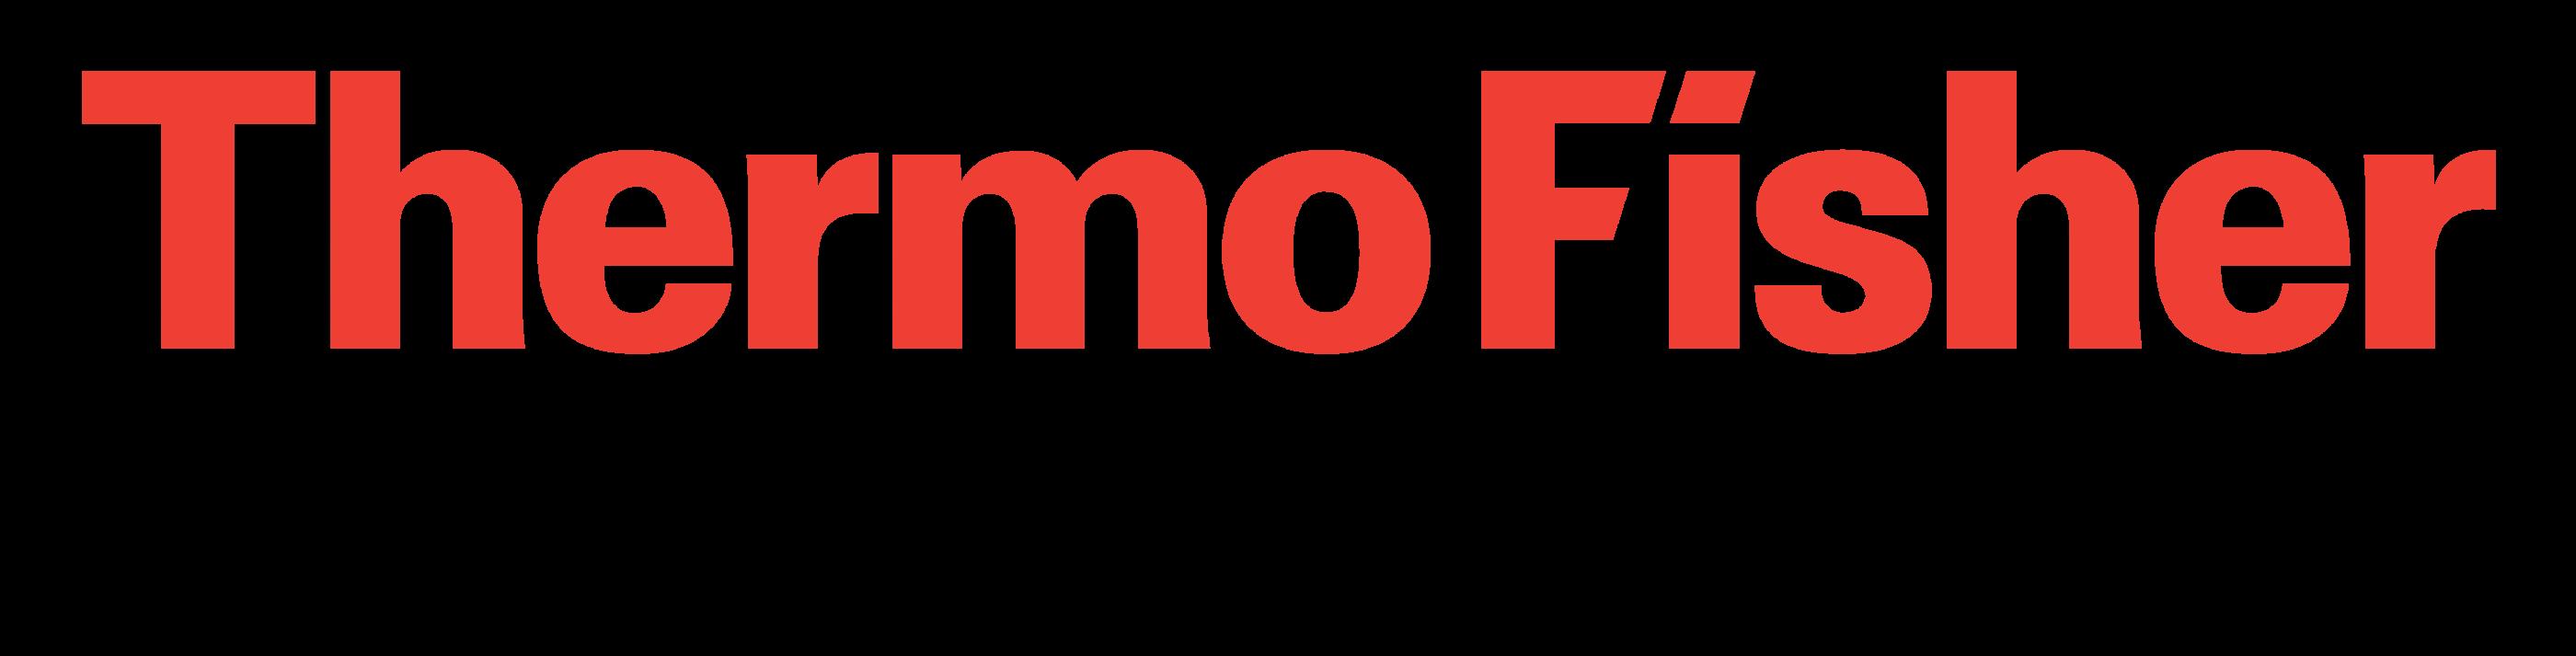 ThermoFisher_Logo